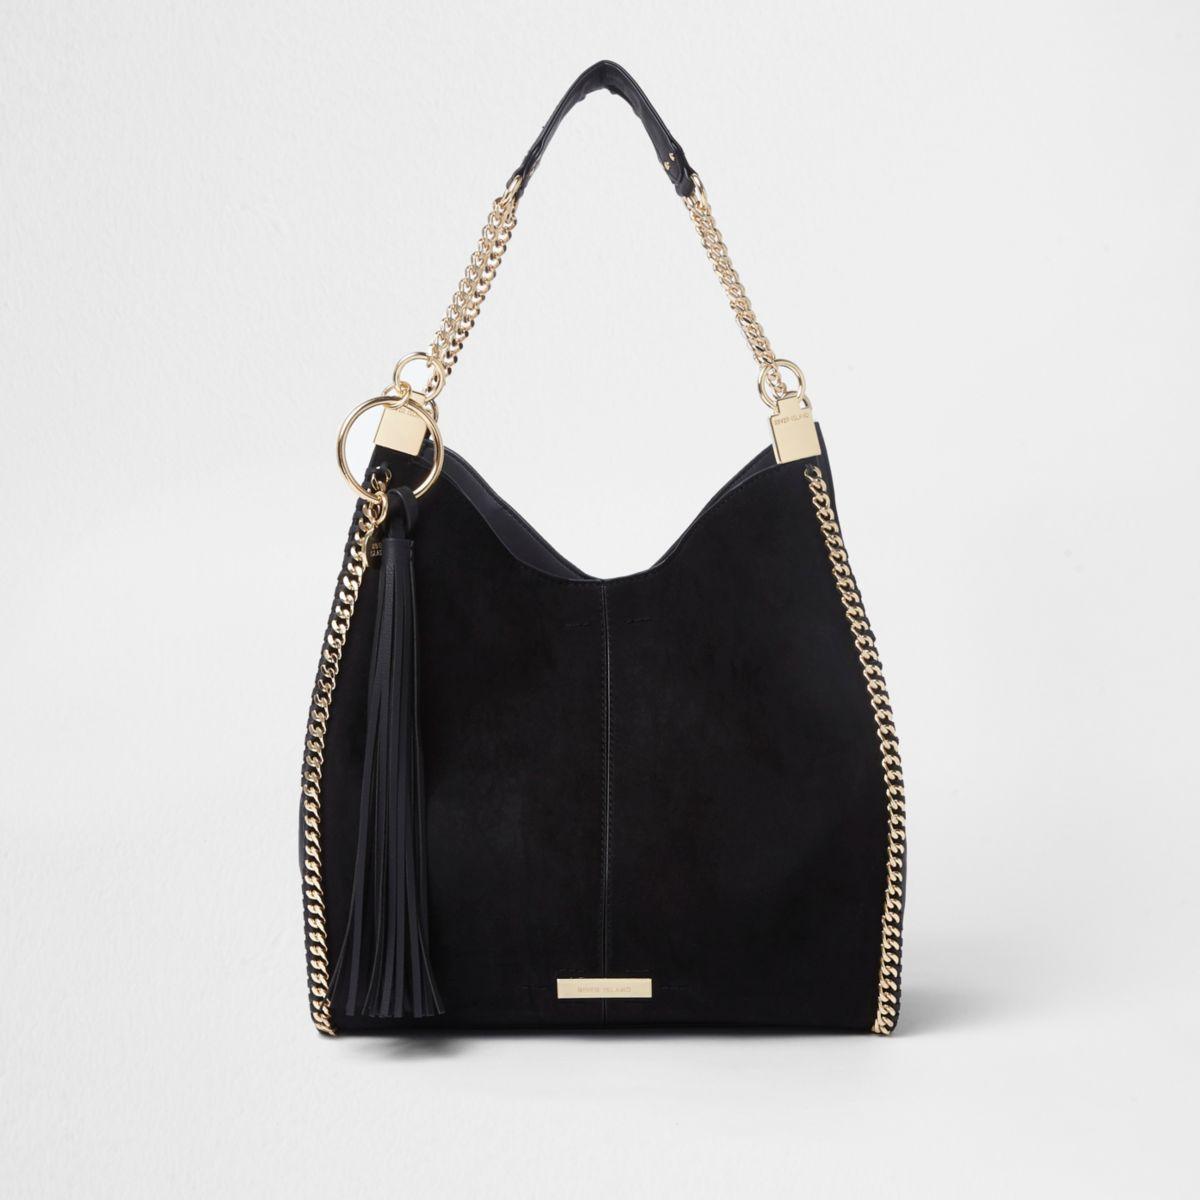 River Island Mini Bag